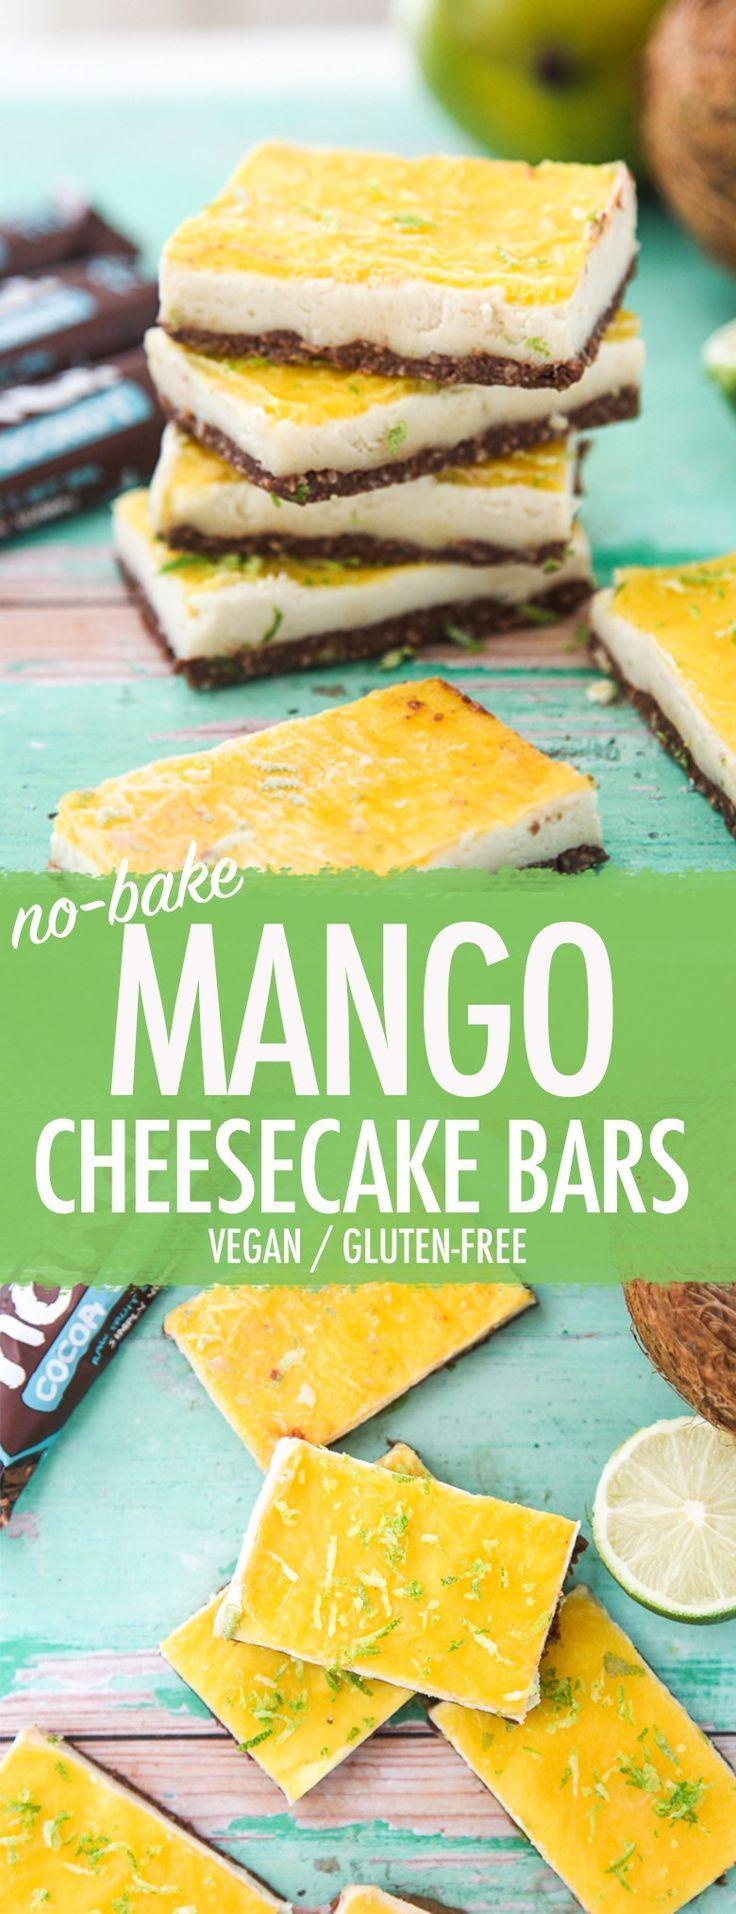 Nakd Mango Cheesecake Bars